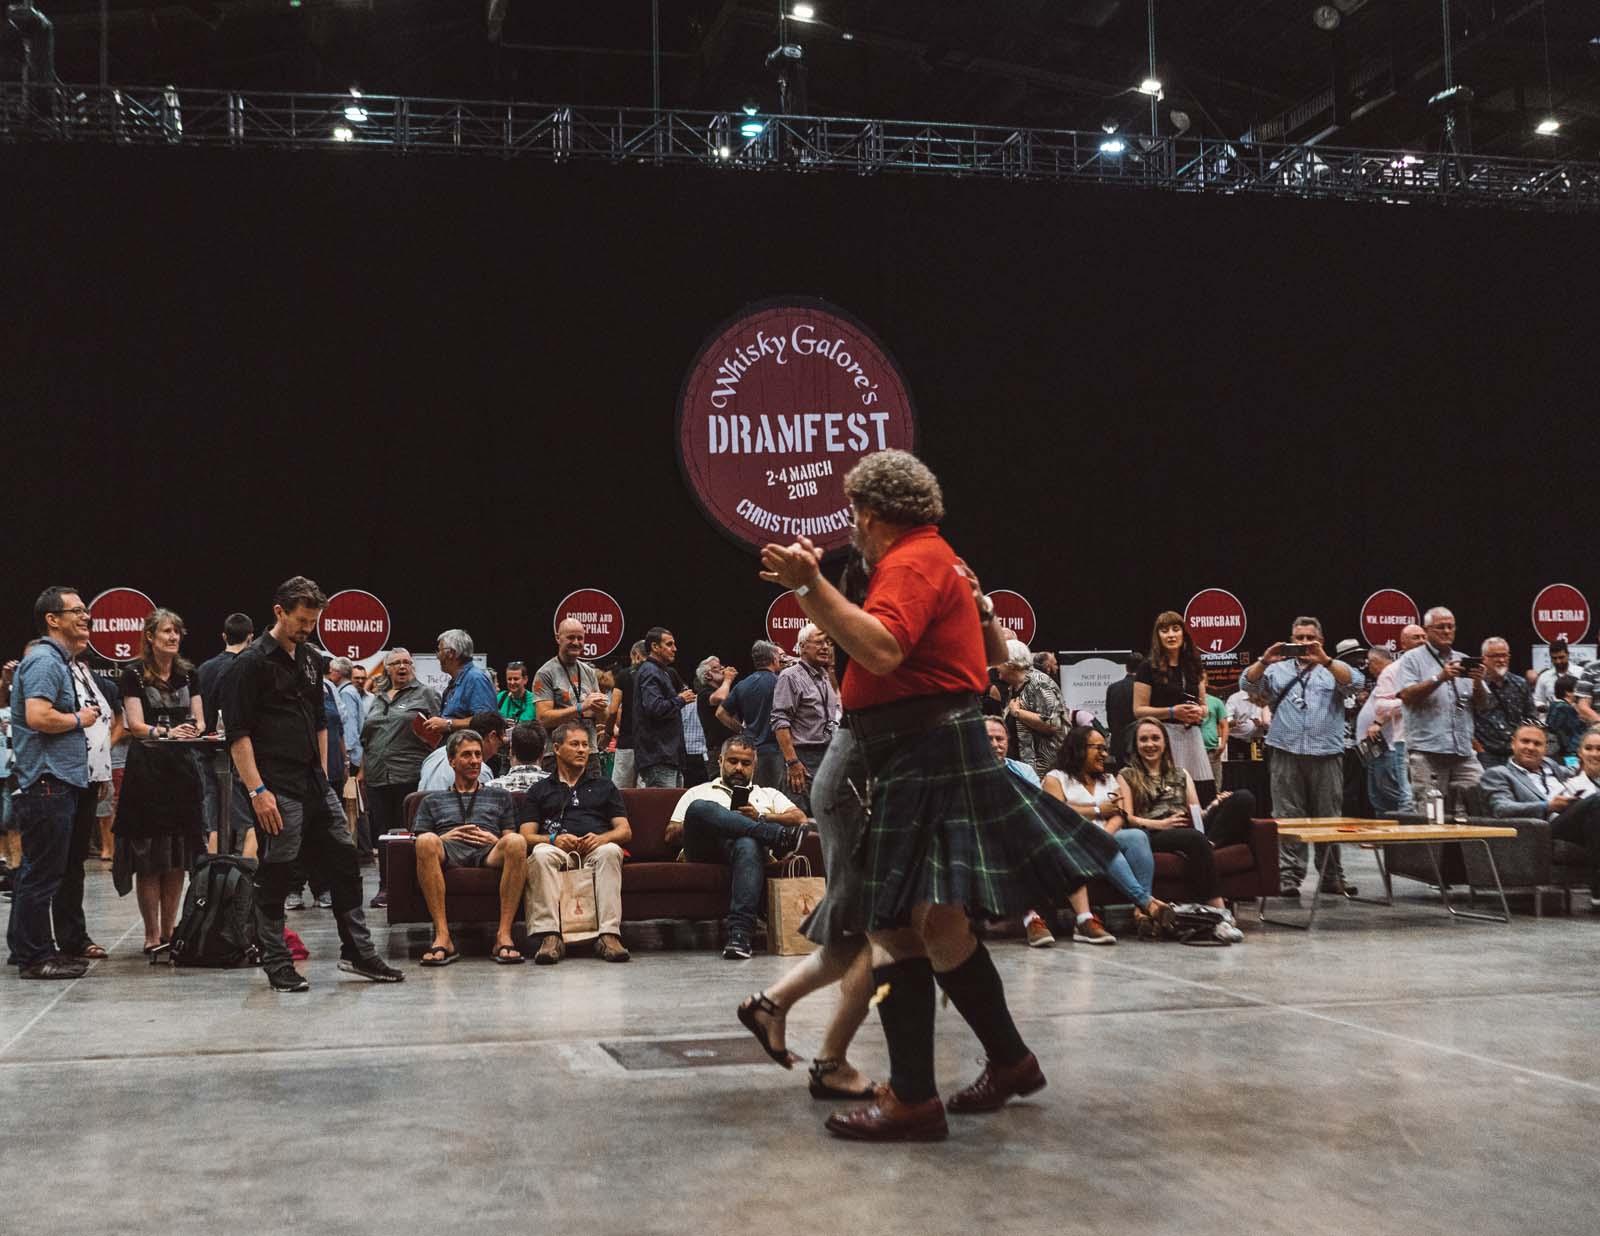 Dramfest 2018 for Whisky Galore-81.jpg